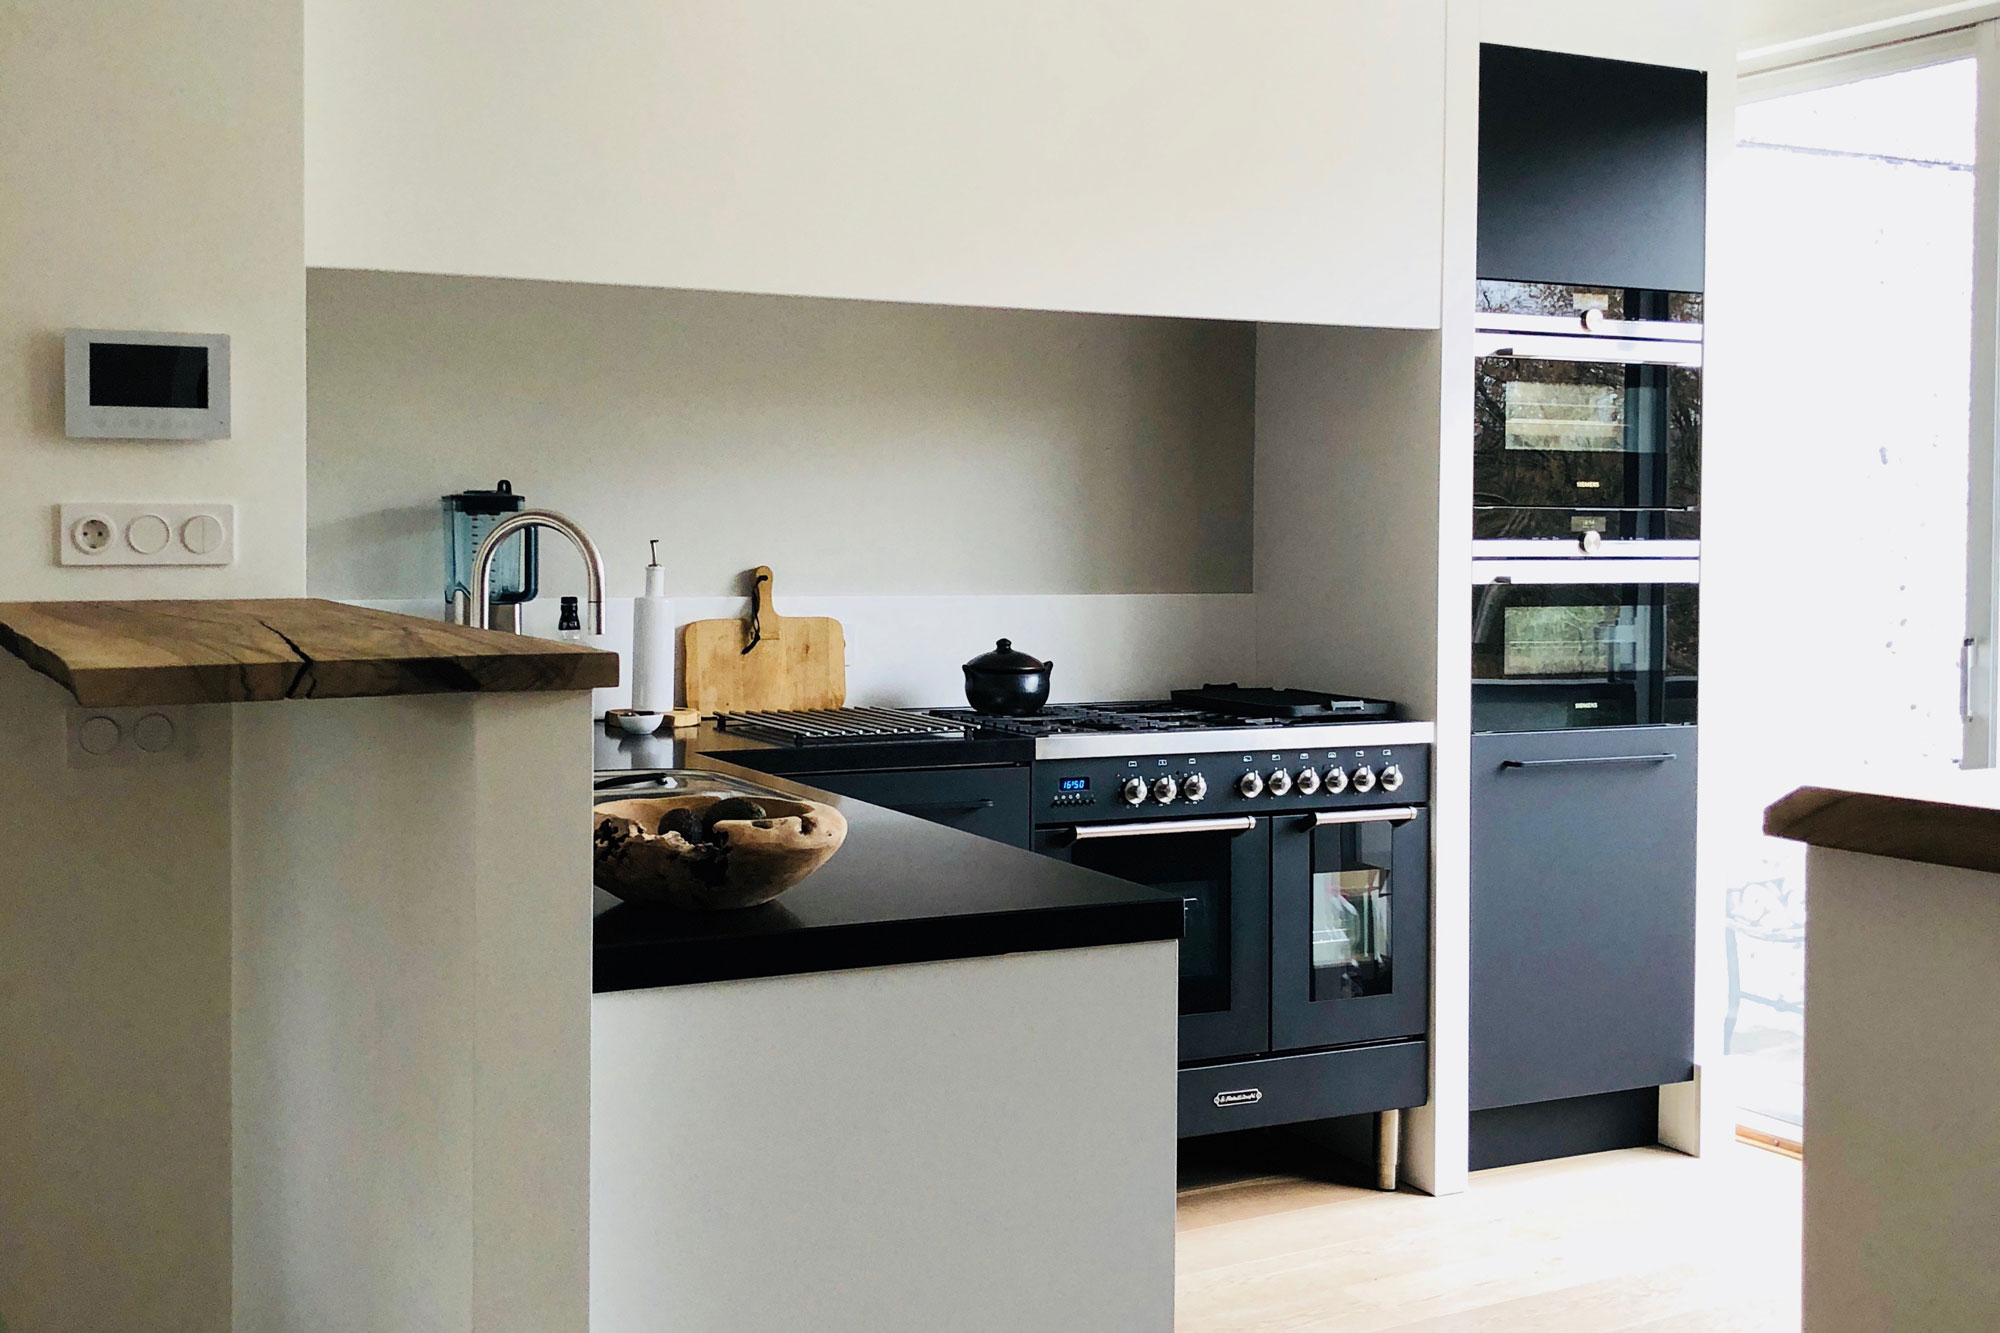 Zwart Keuken Fornuis : Keuken in zwart wit blos interieur